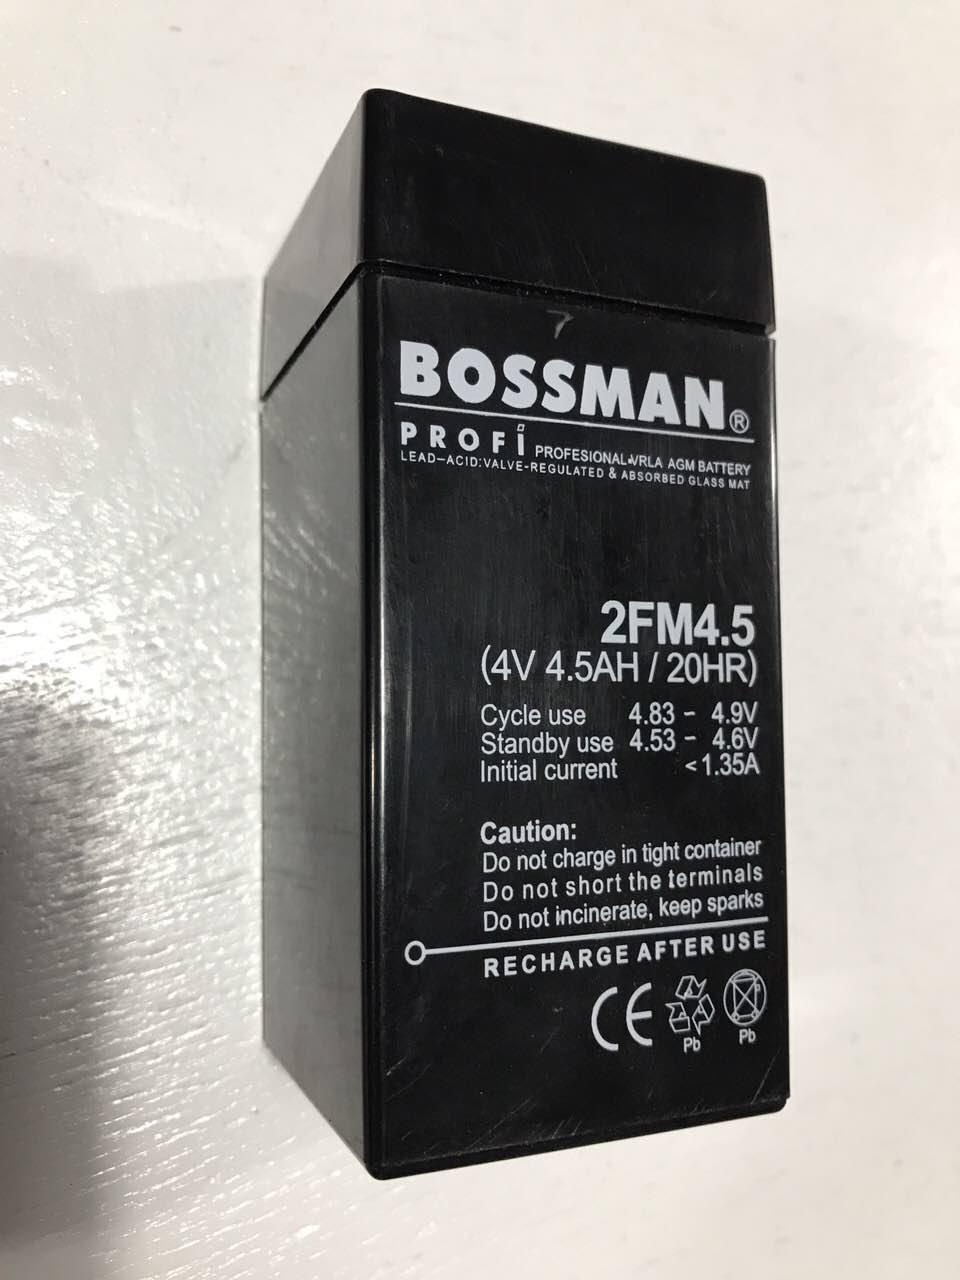 Акумулятор 4V 4500mAh BOSSMAN 2FM4,5